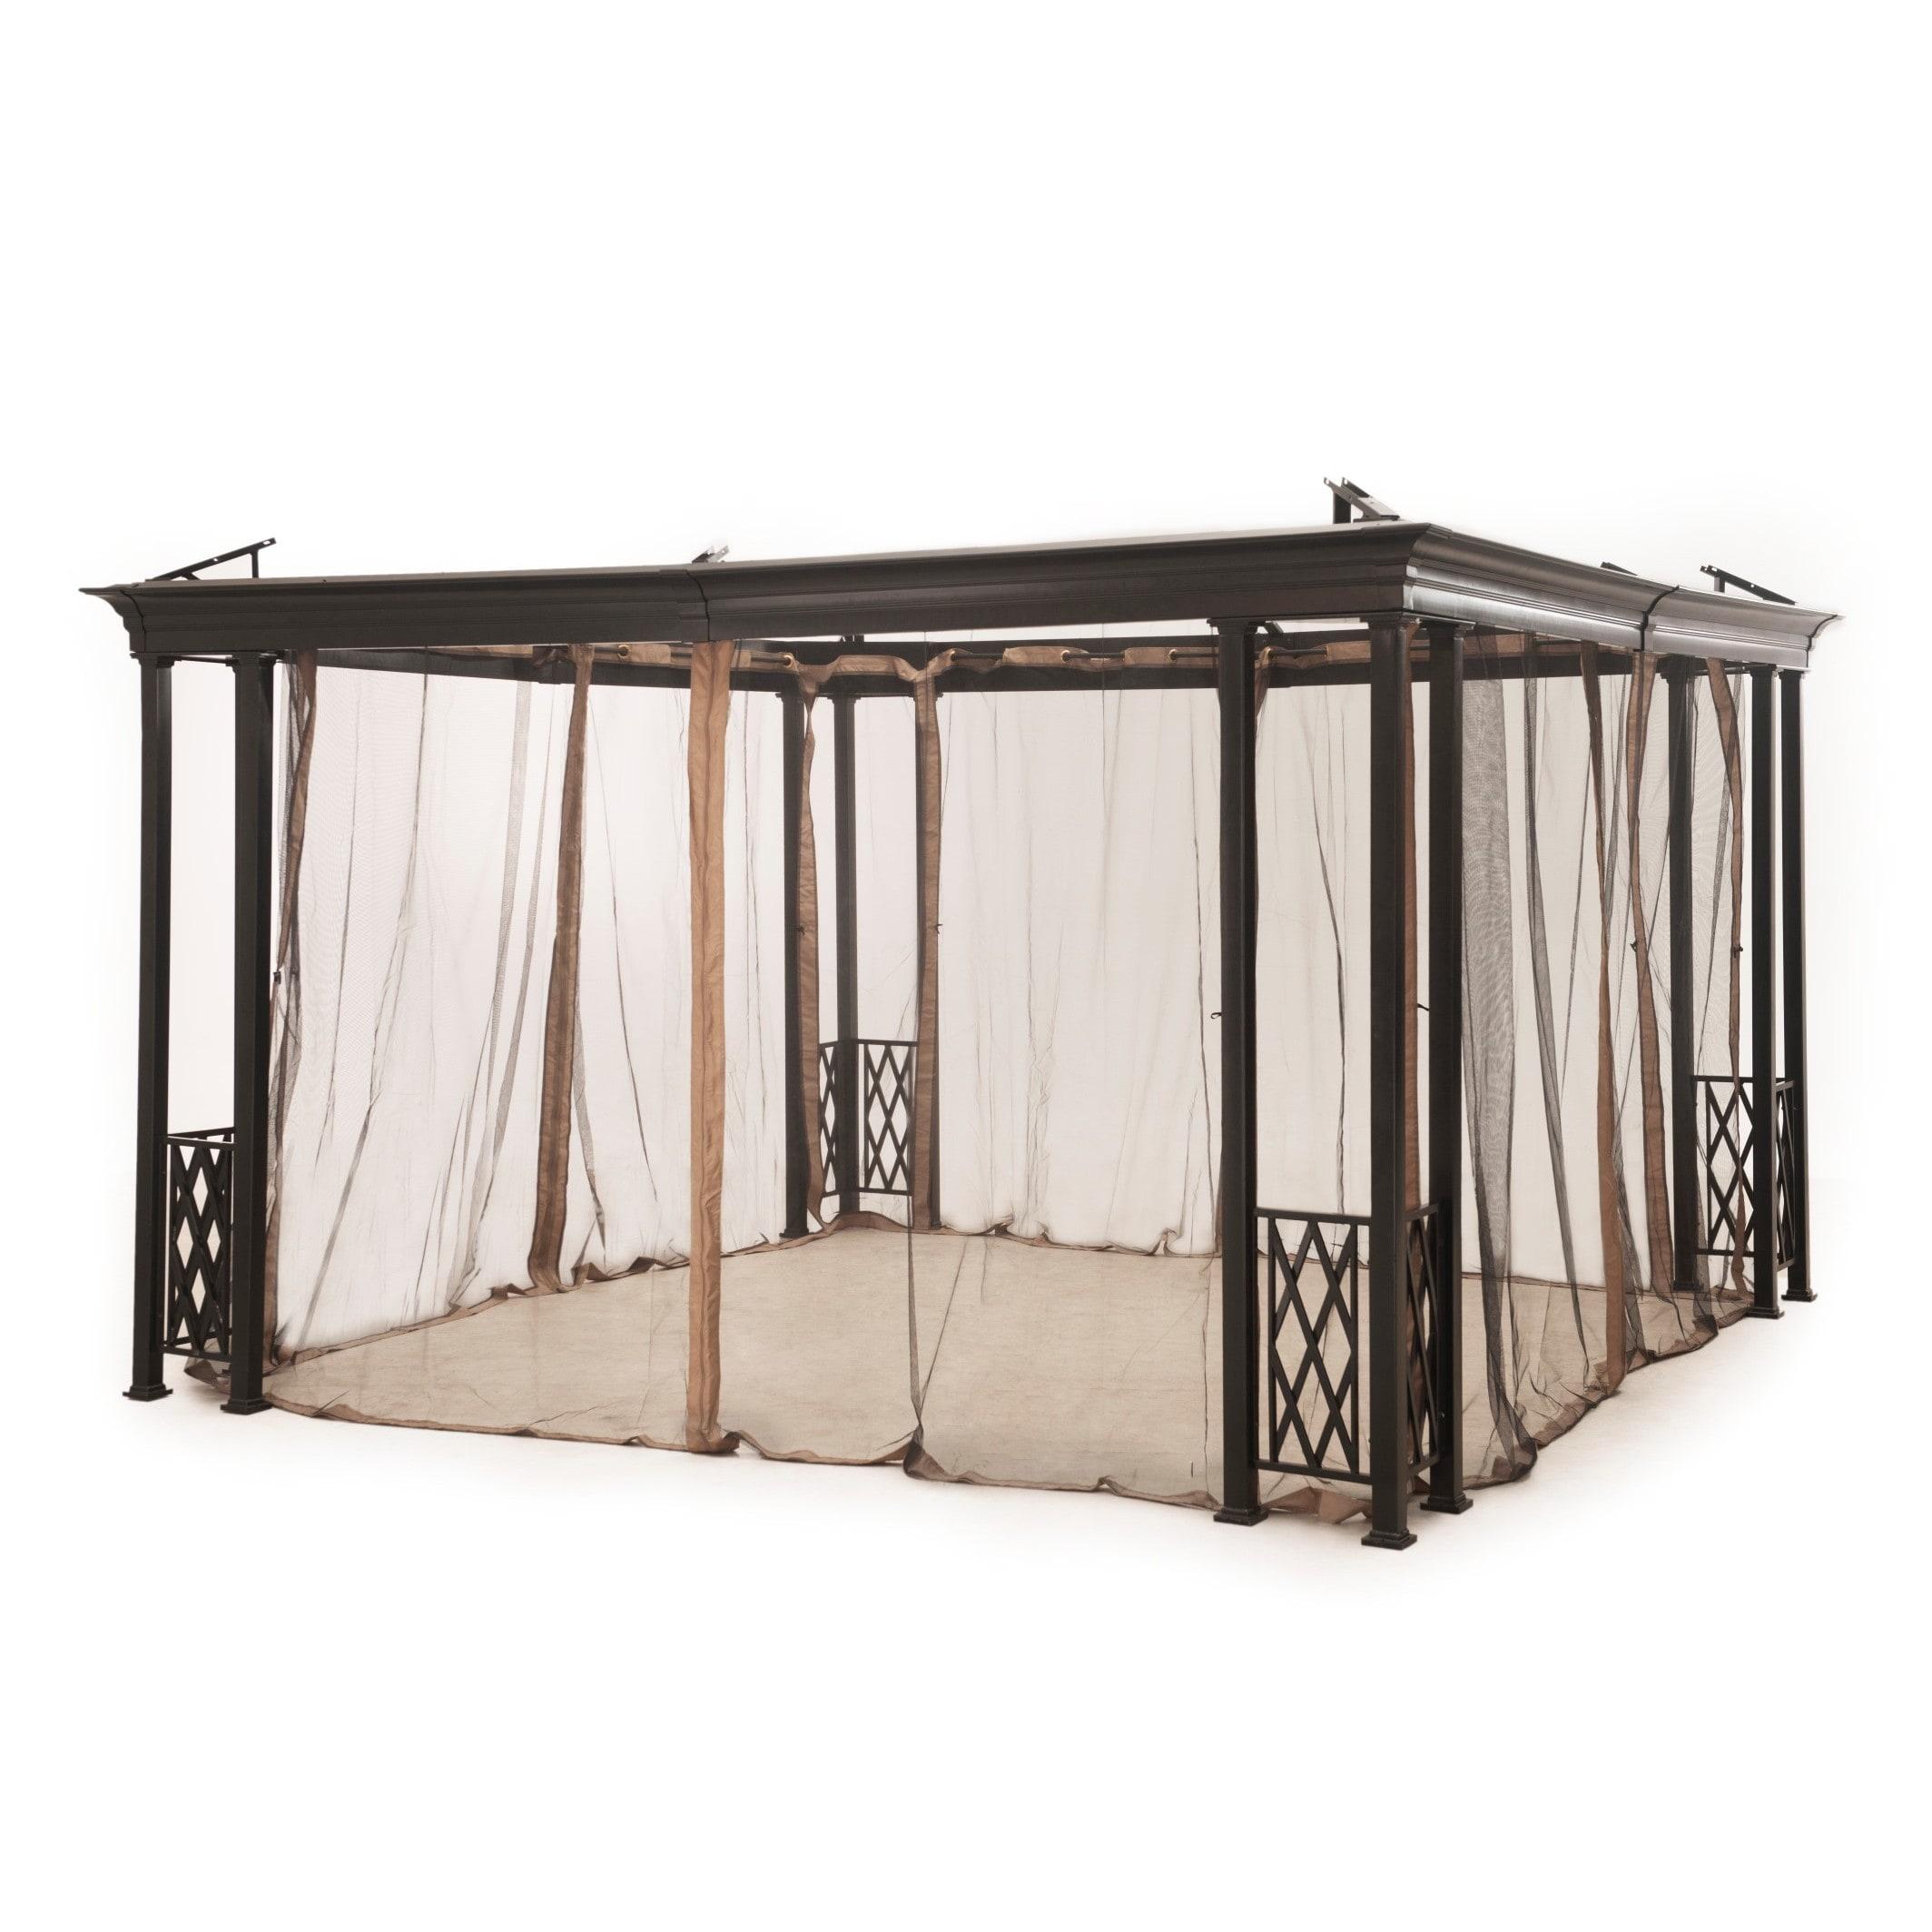 Sunjoy Universal Netting for 12 foot x 12 foot Gazebo Free